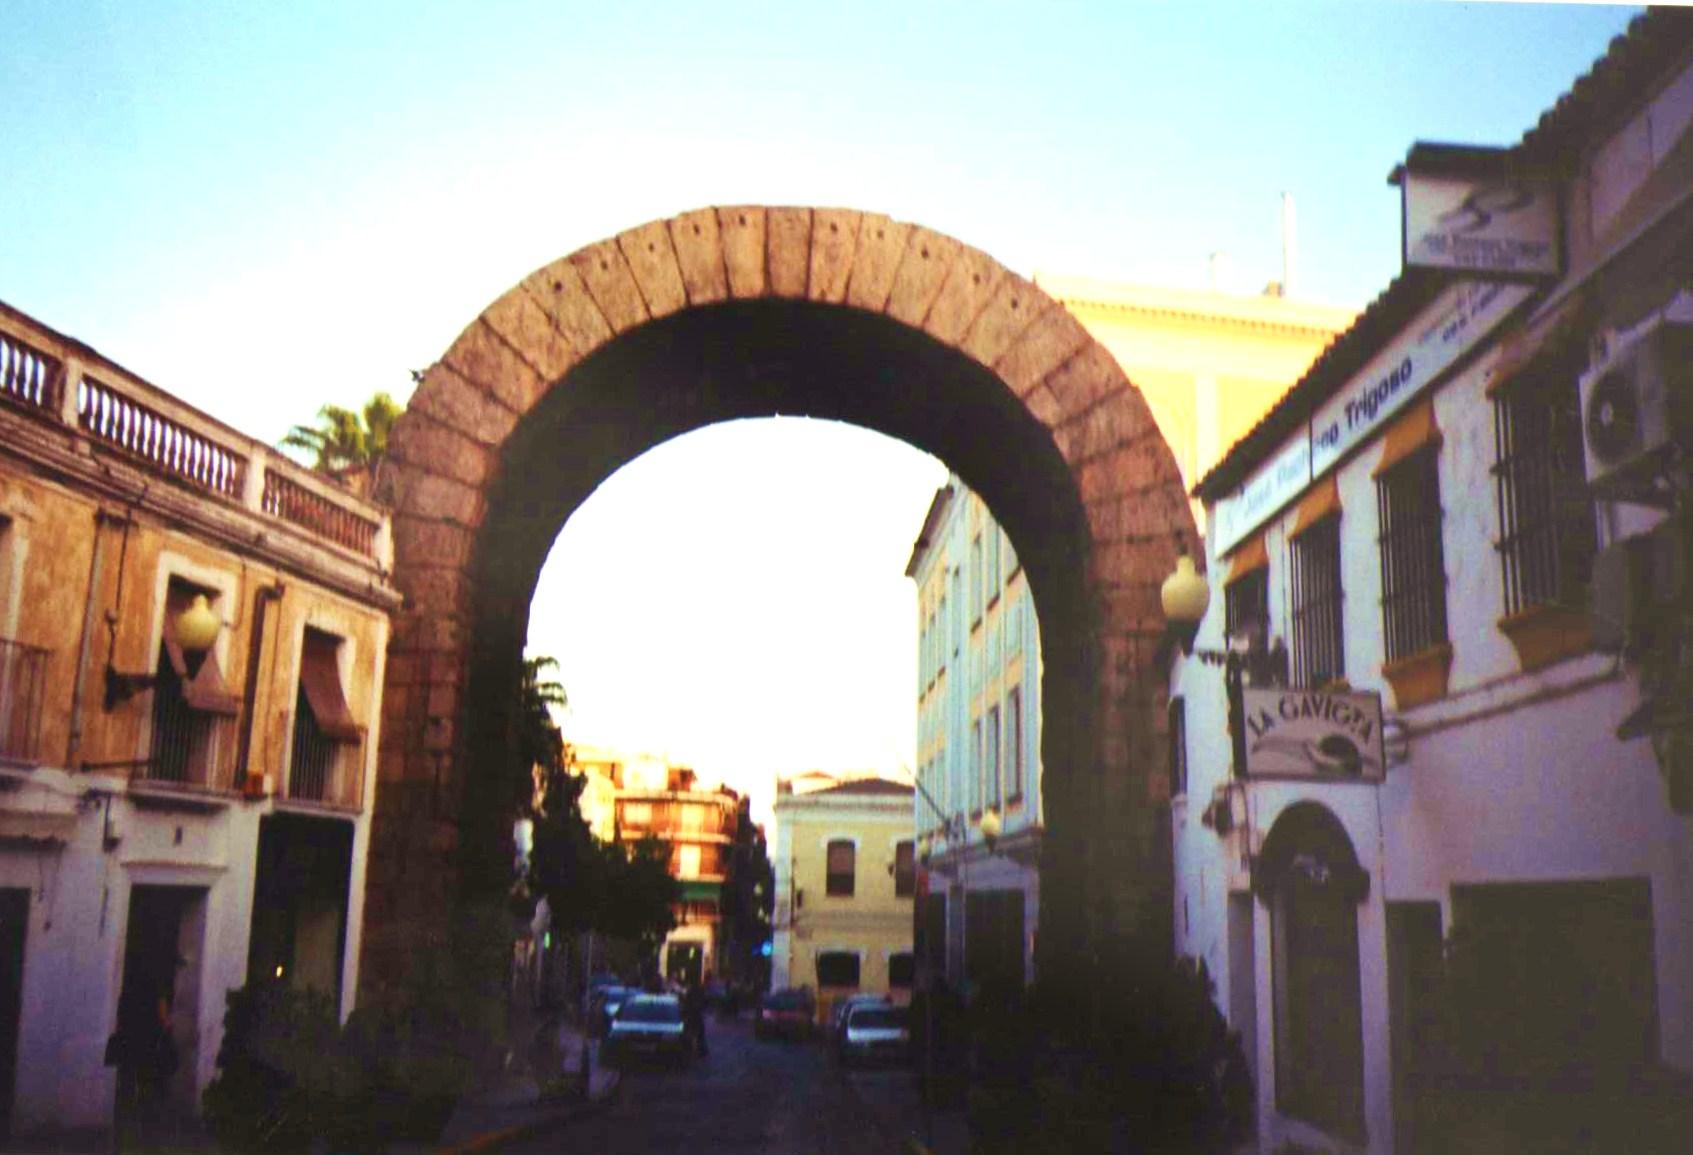 File:Arco de Trajano, Mérida (Extremadura).jpg - Wikimedia Commons